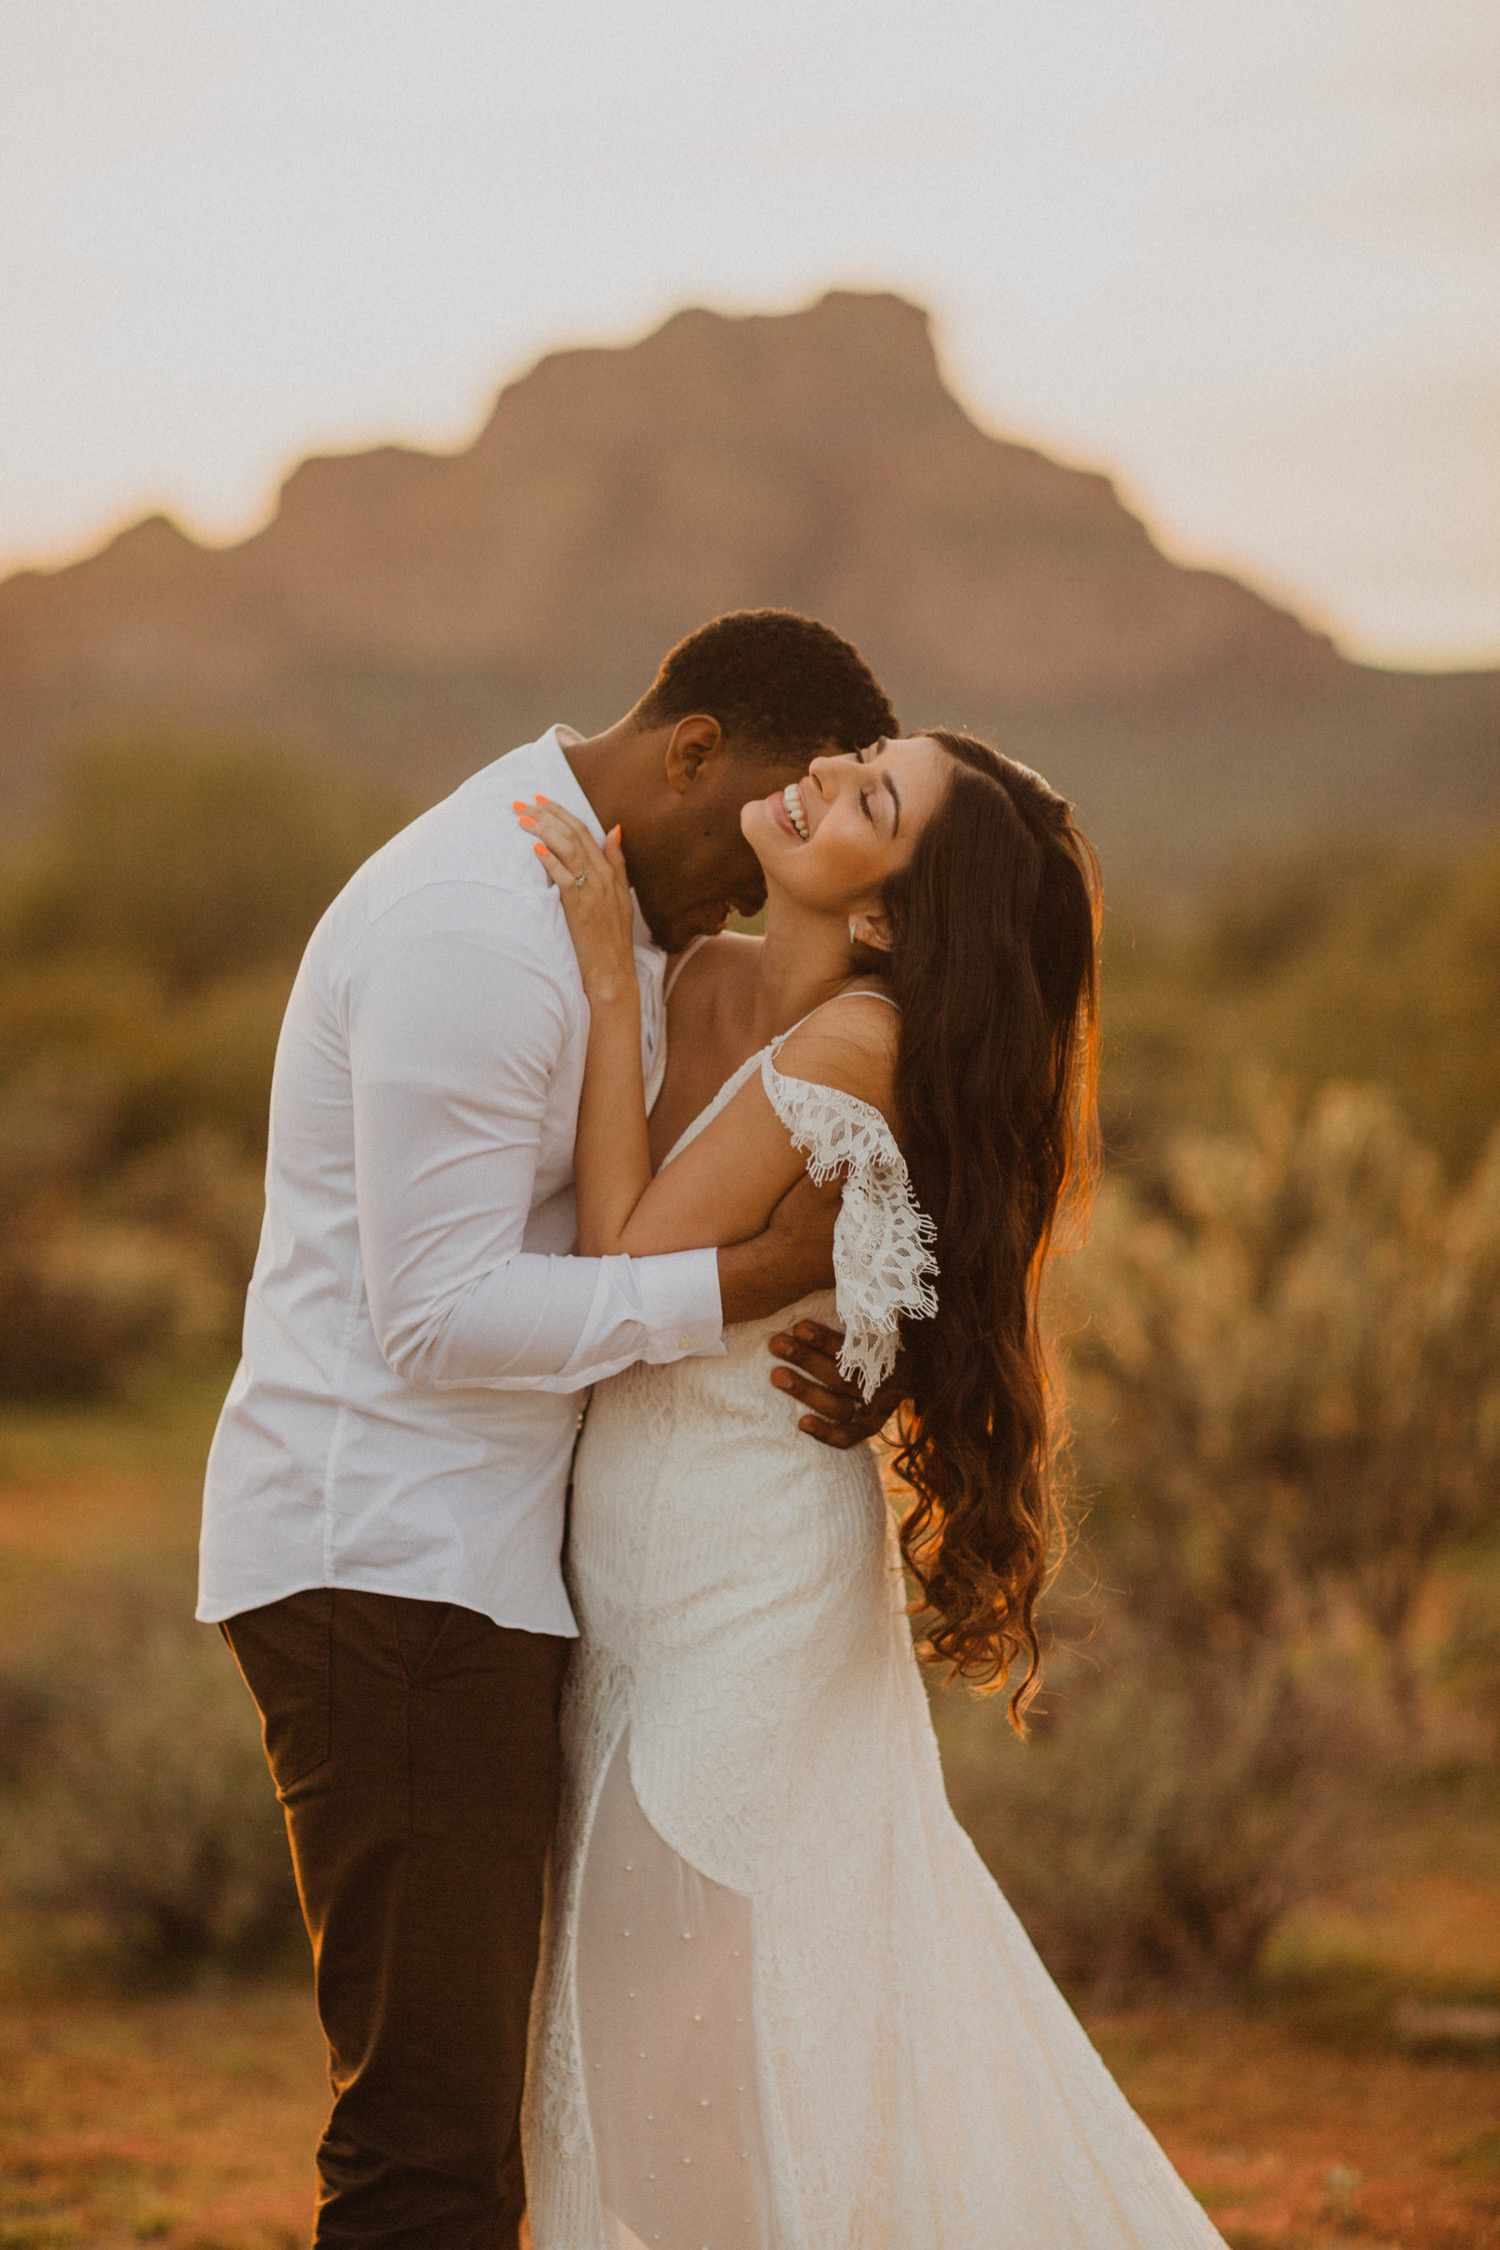 A Beautiful Bridal Blowout